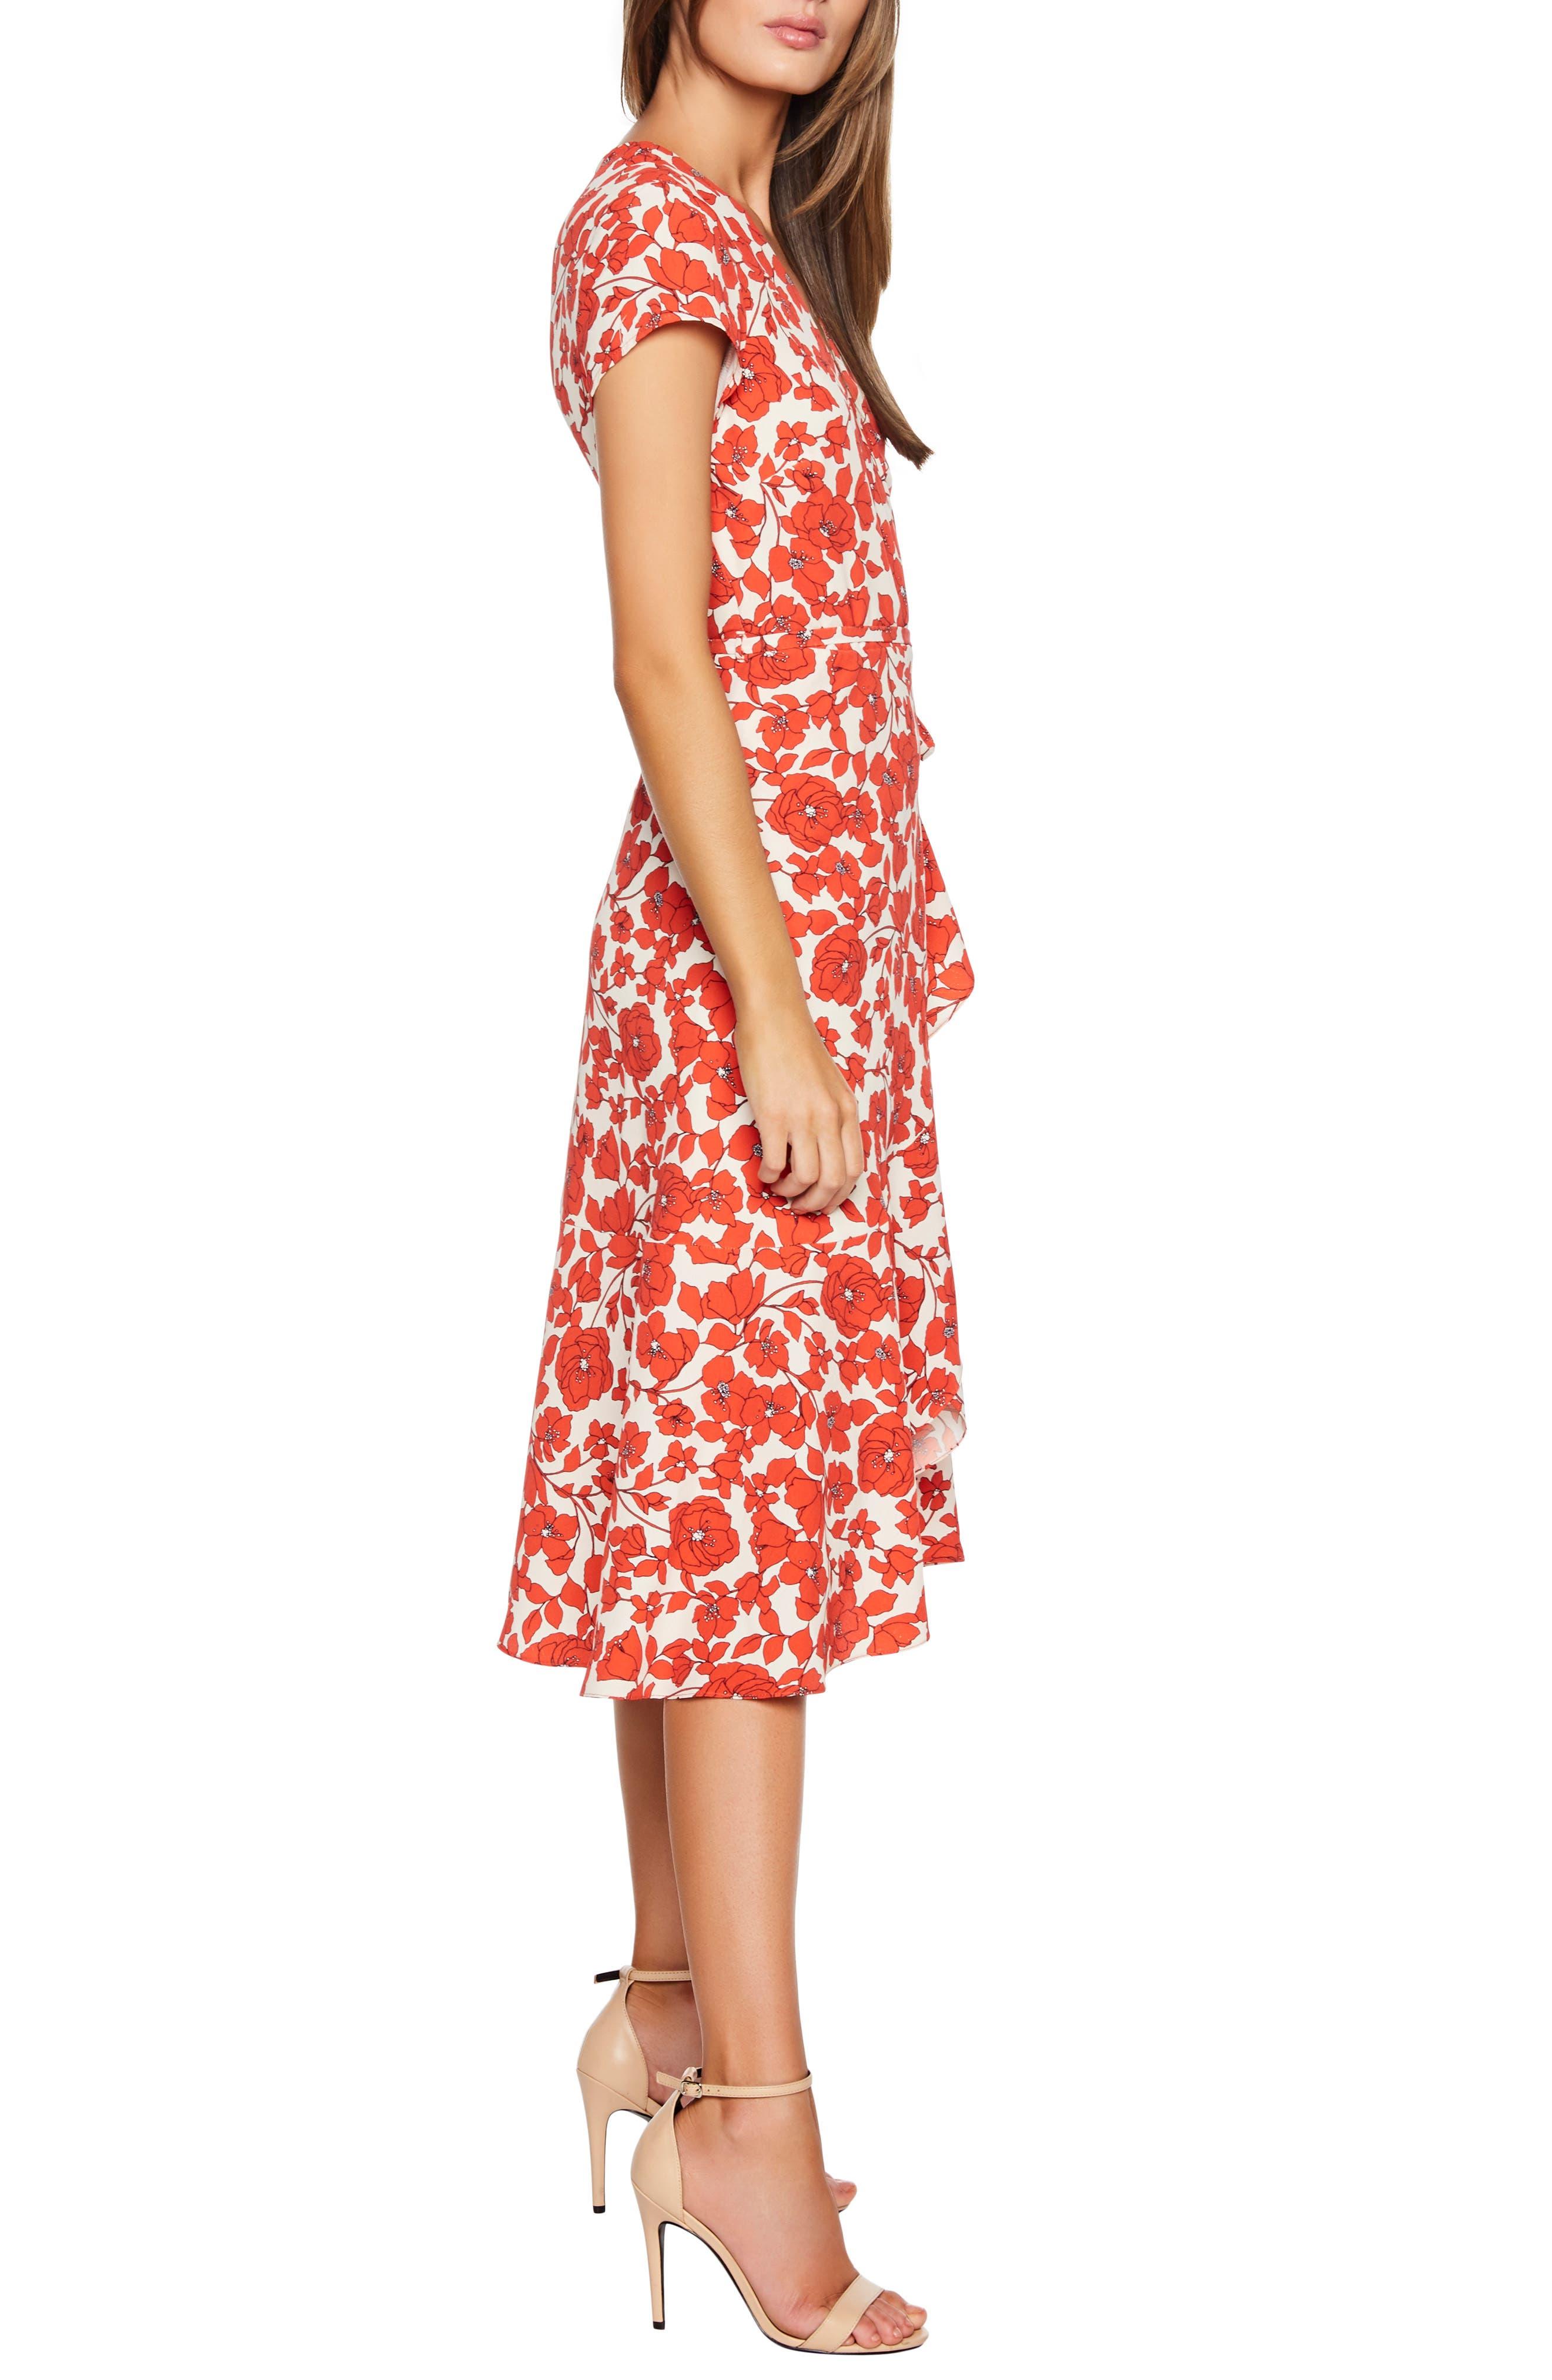 BARDOT, Fiesta Floral Midi Dress, Alternate thumbnail 4, color, 800